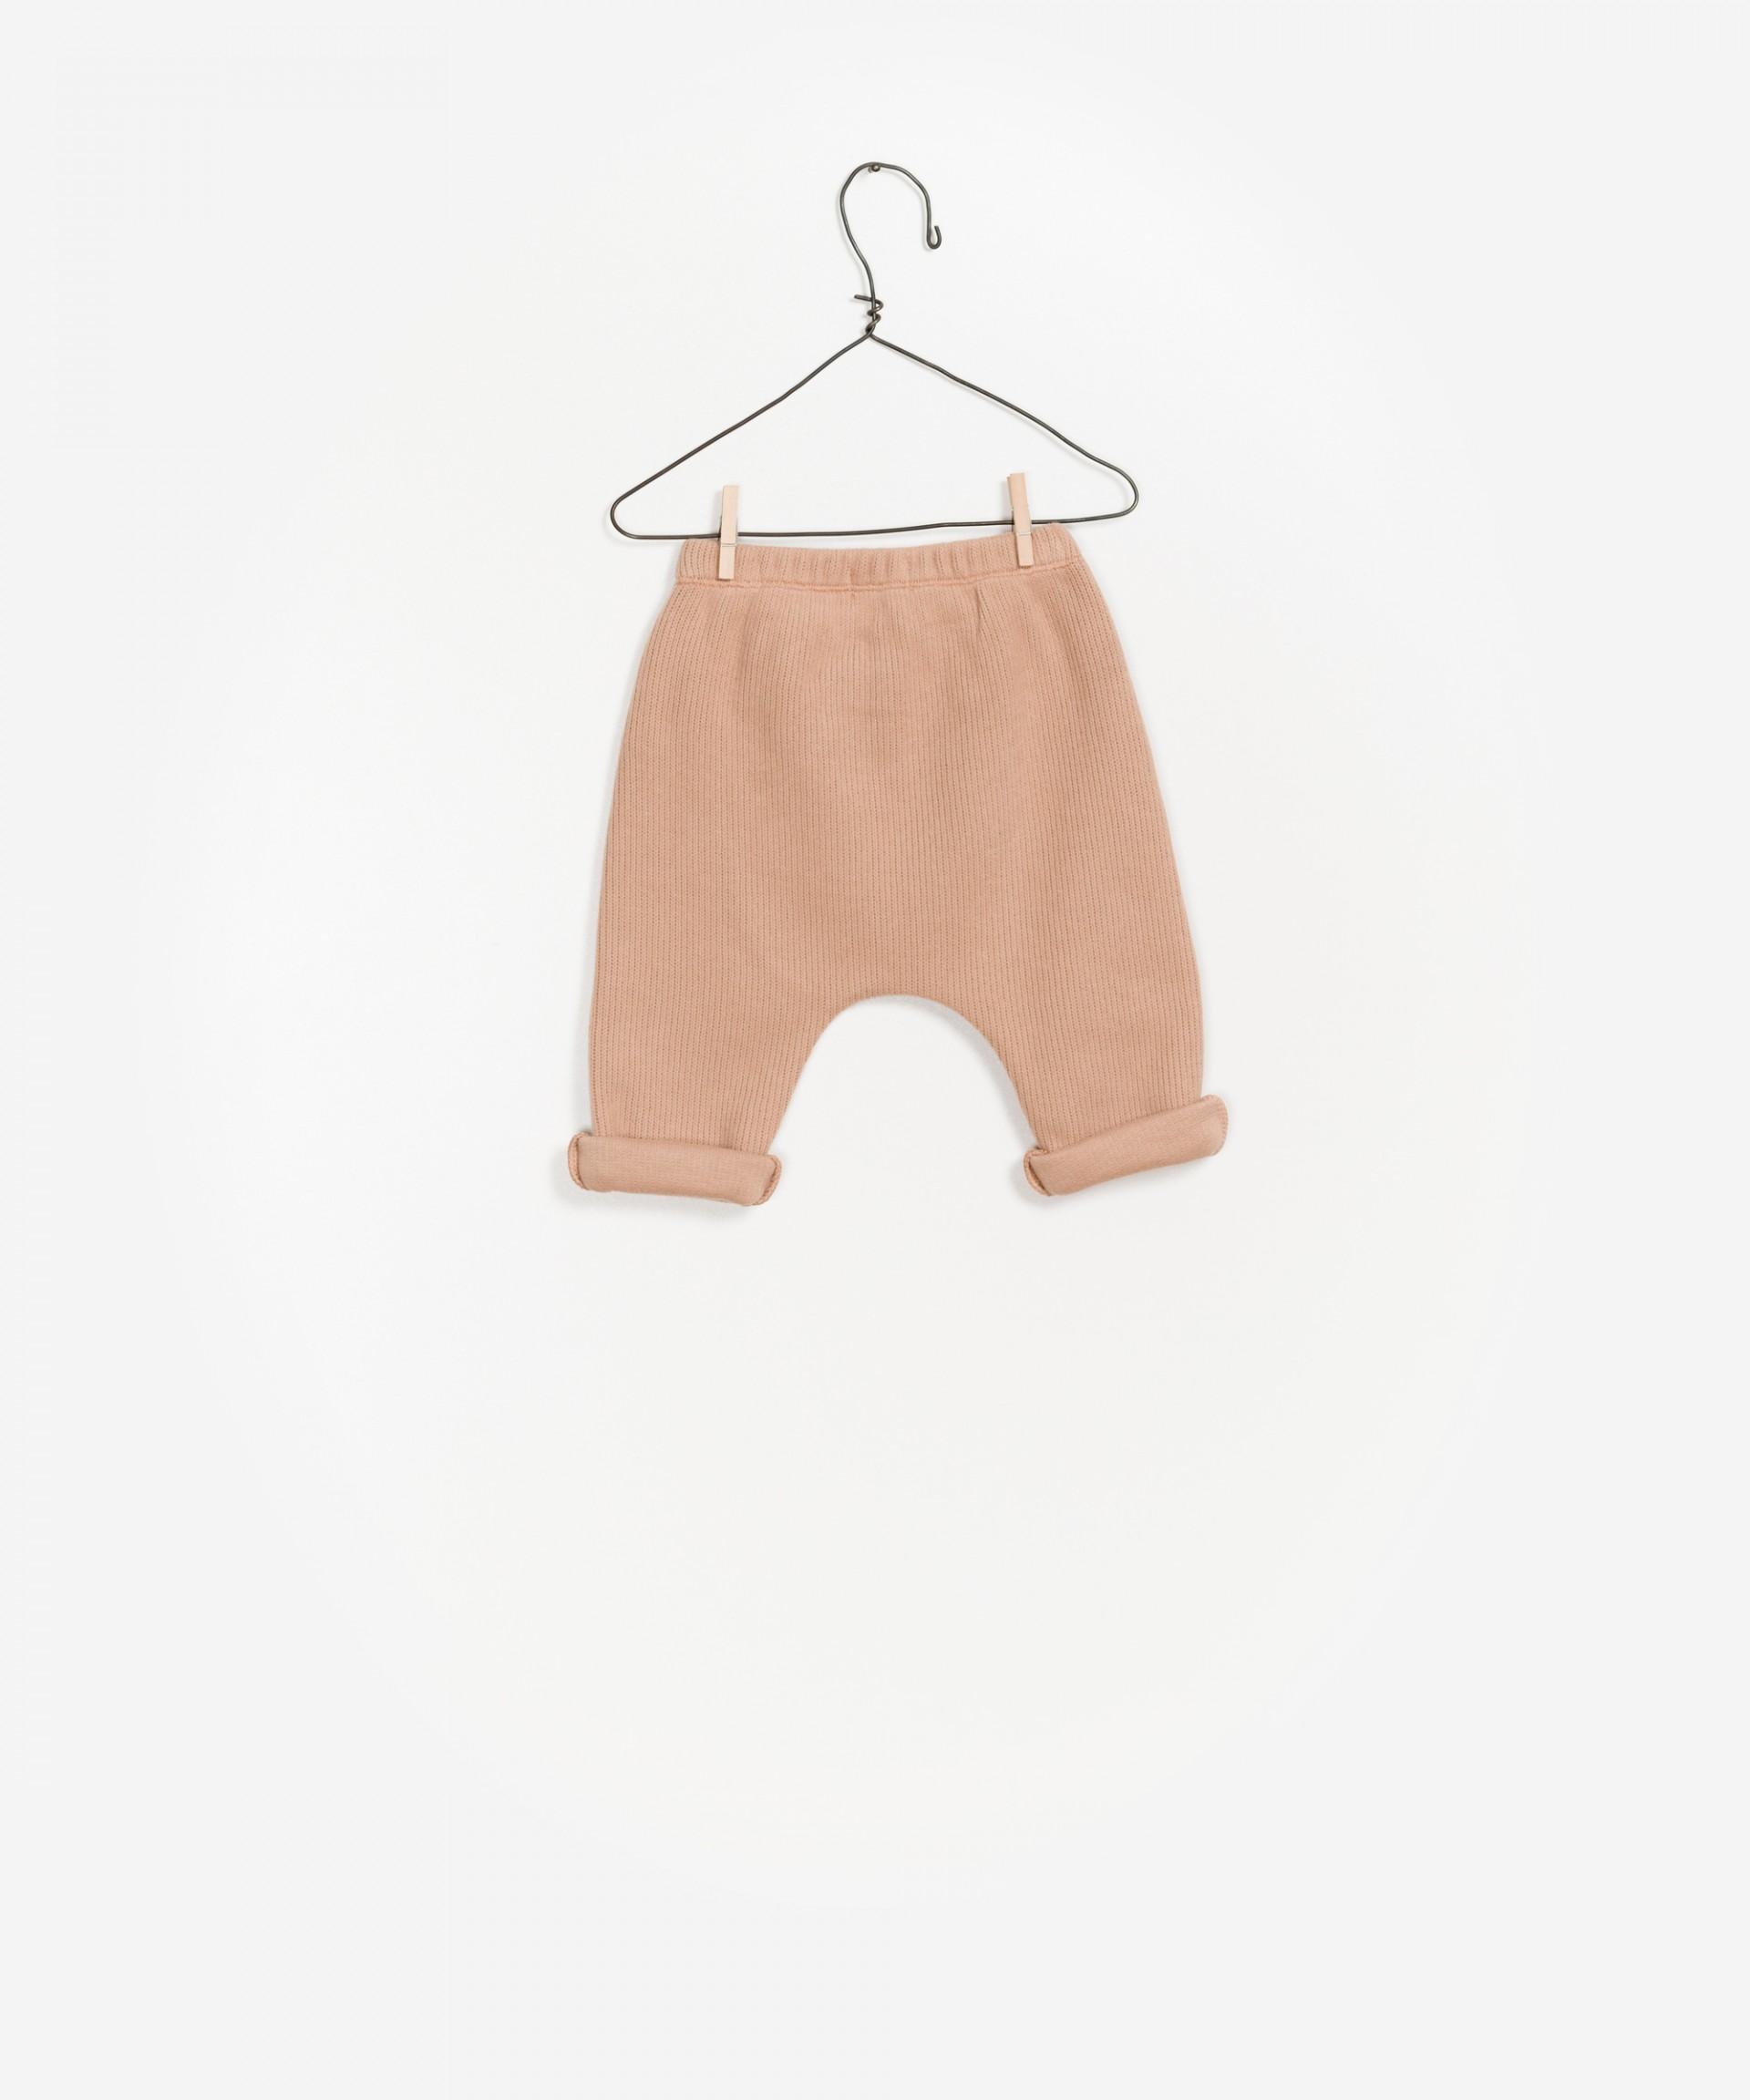 Rib knit pants, elastic waist